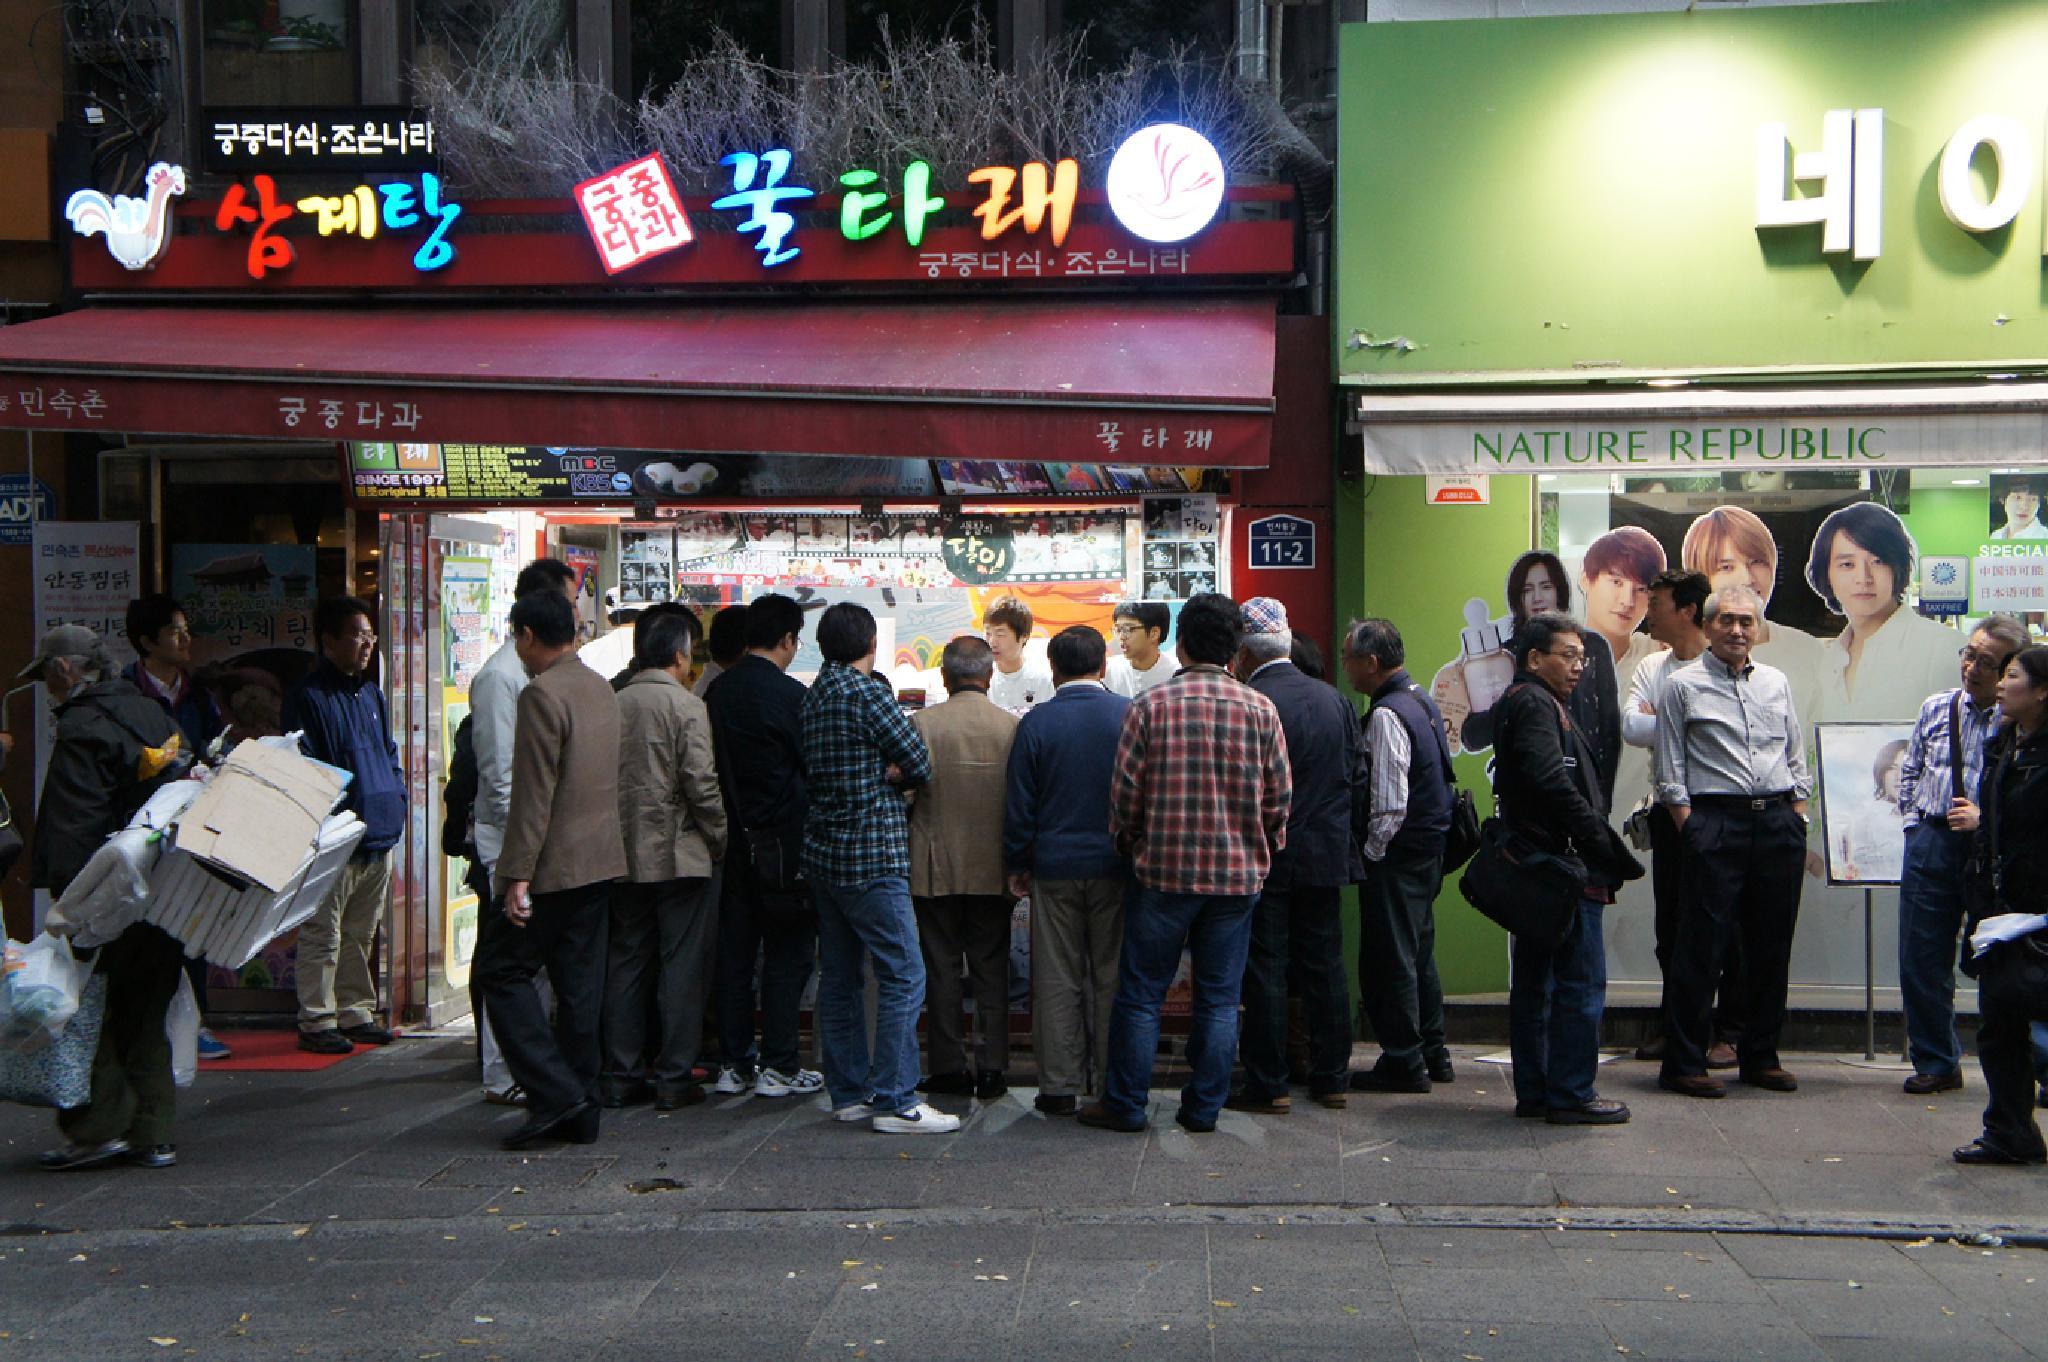 Street Food in Korea by rujito69